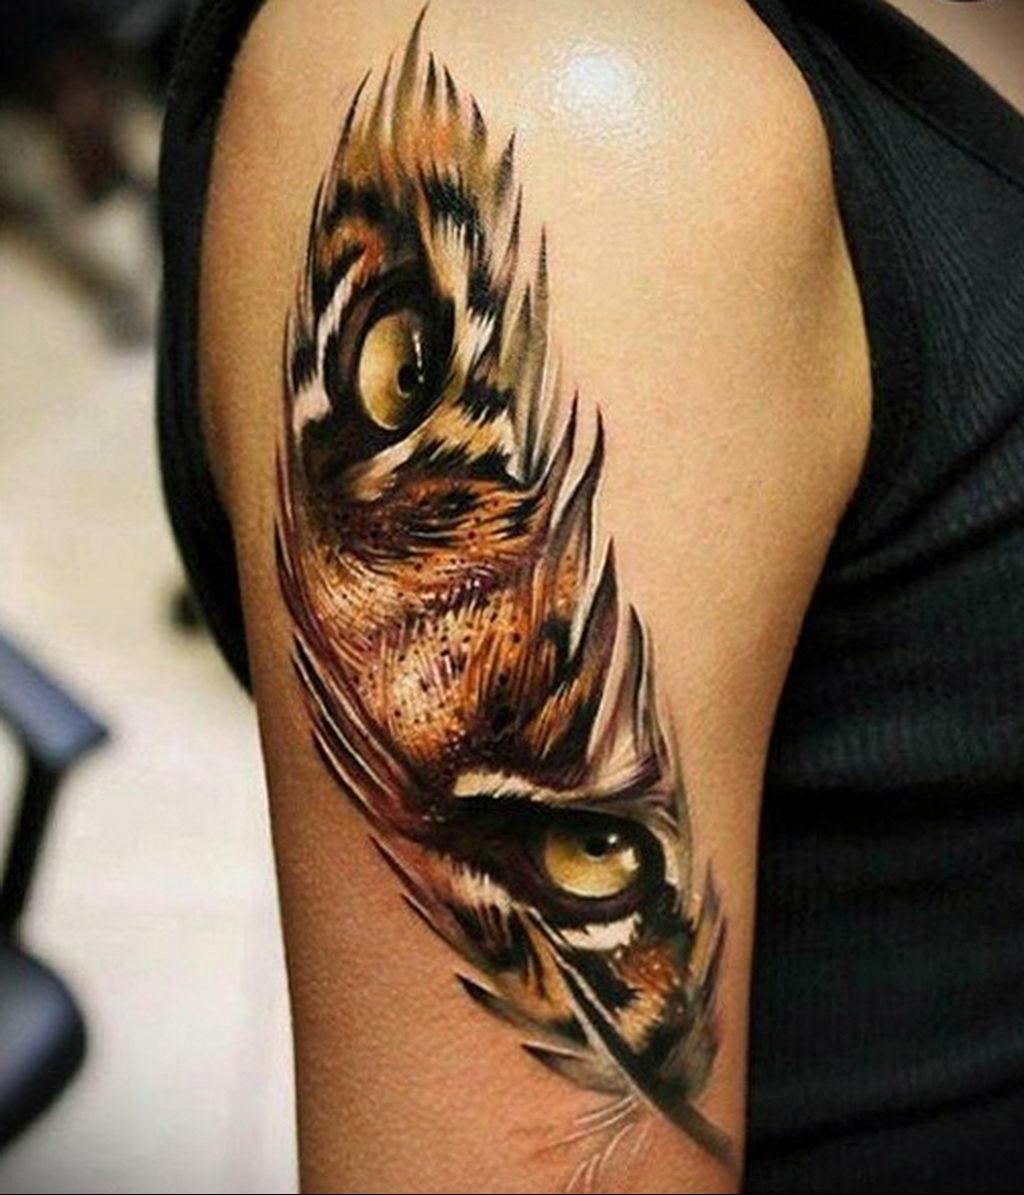 Фото тату про любовь рисунок Перо 03.02.2020 №231 -tattoo feather- tatufoto.com